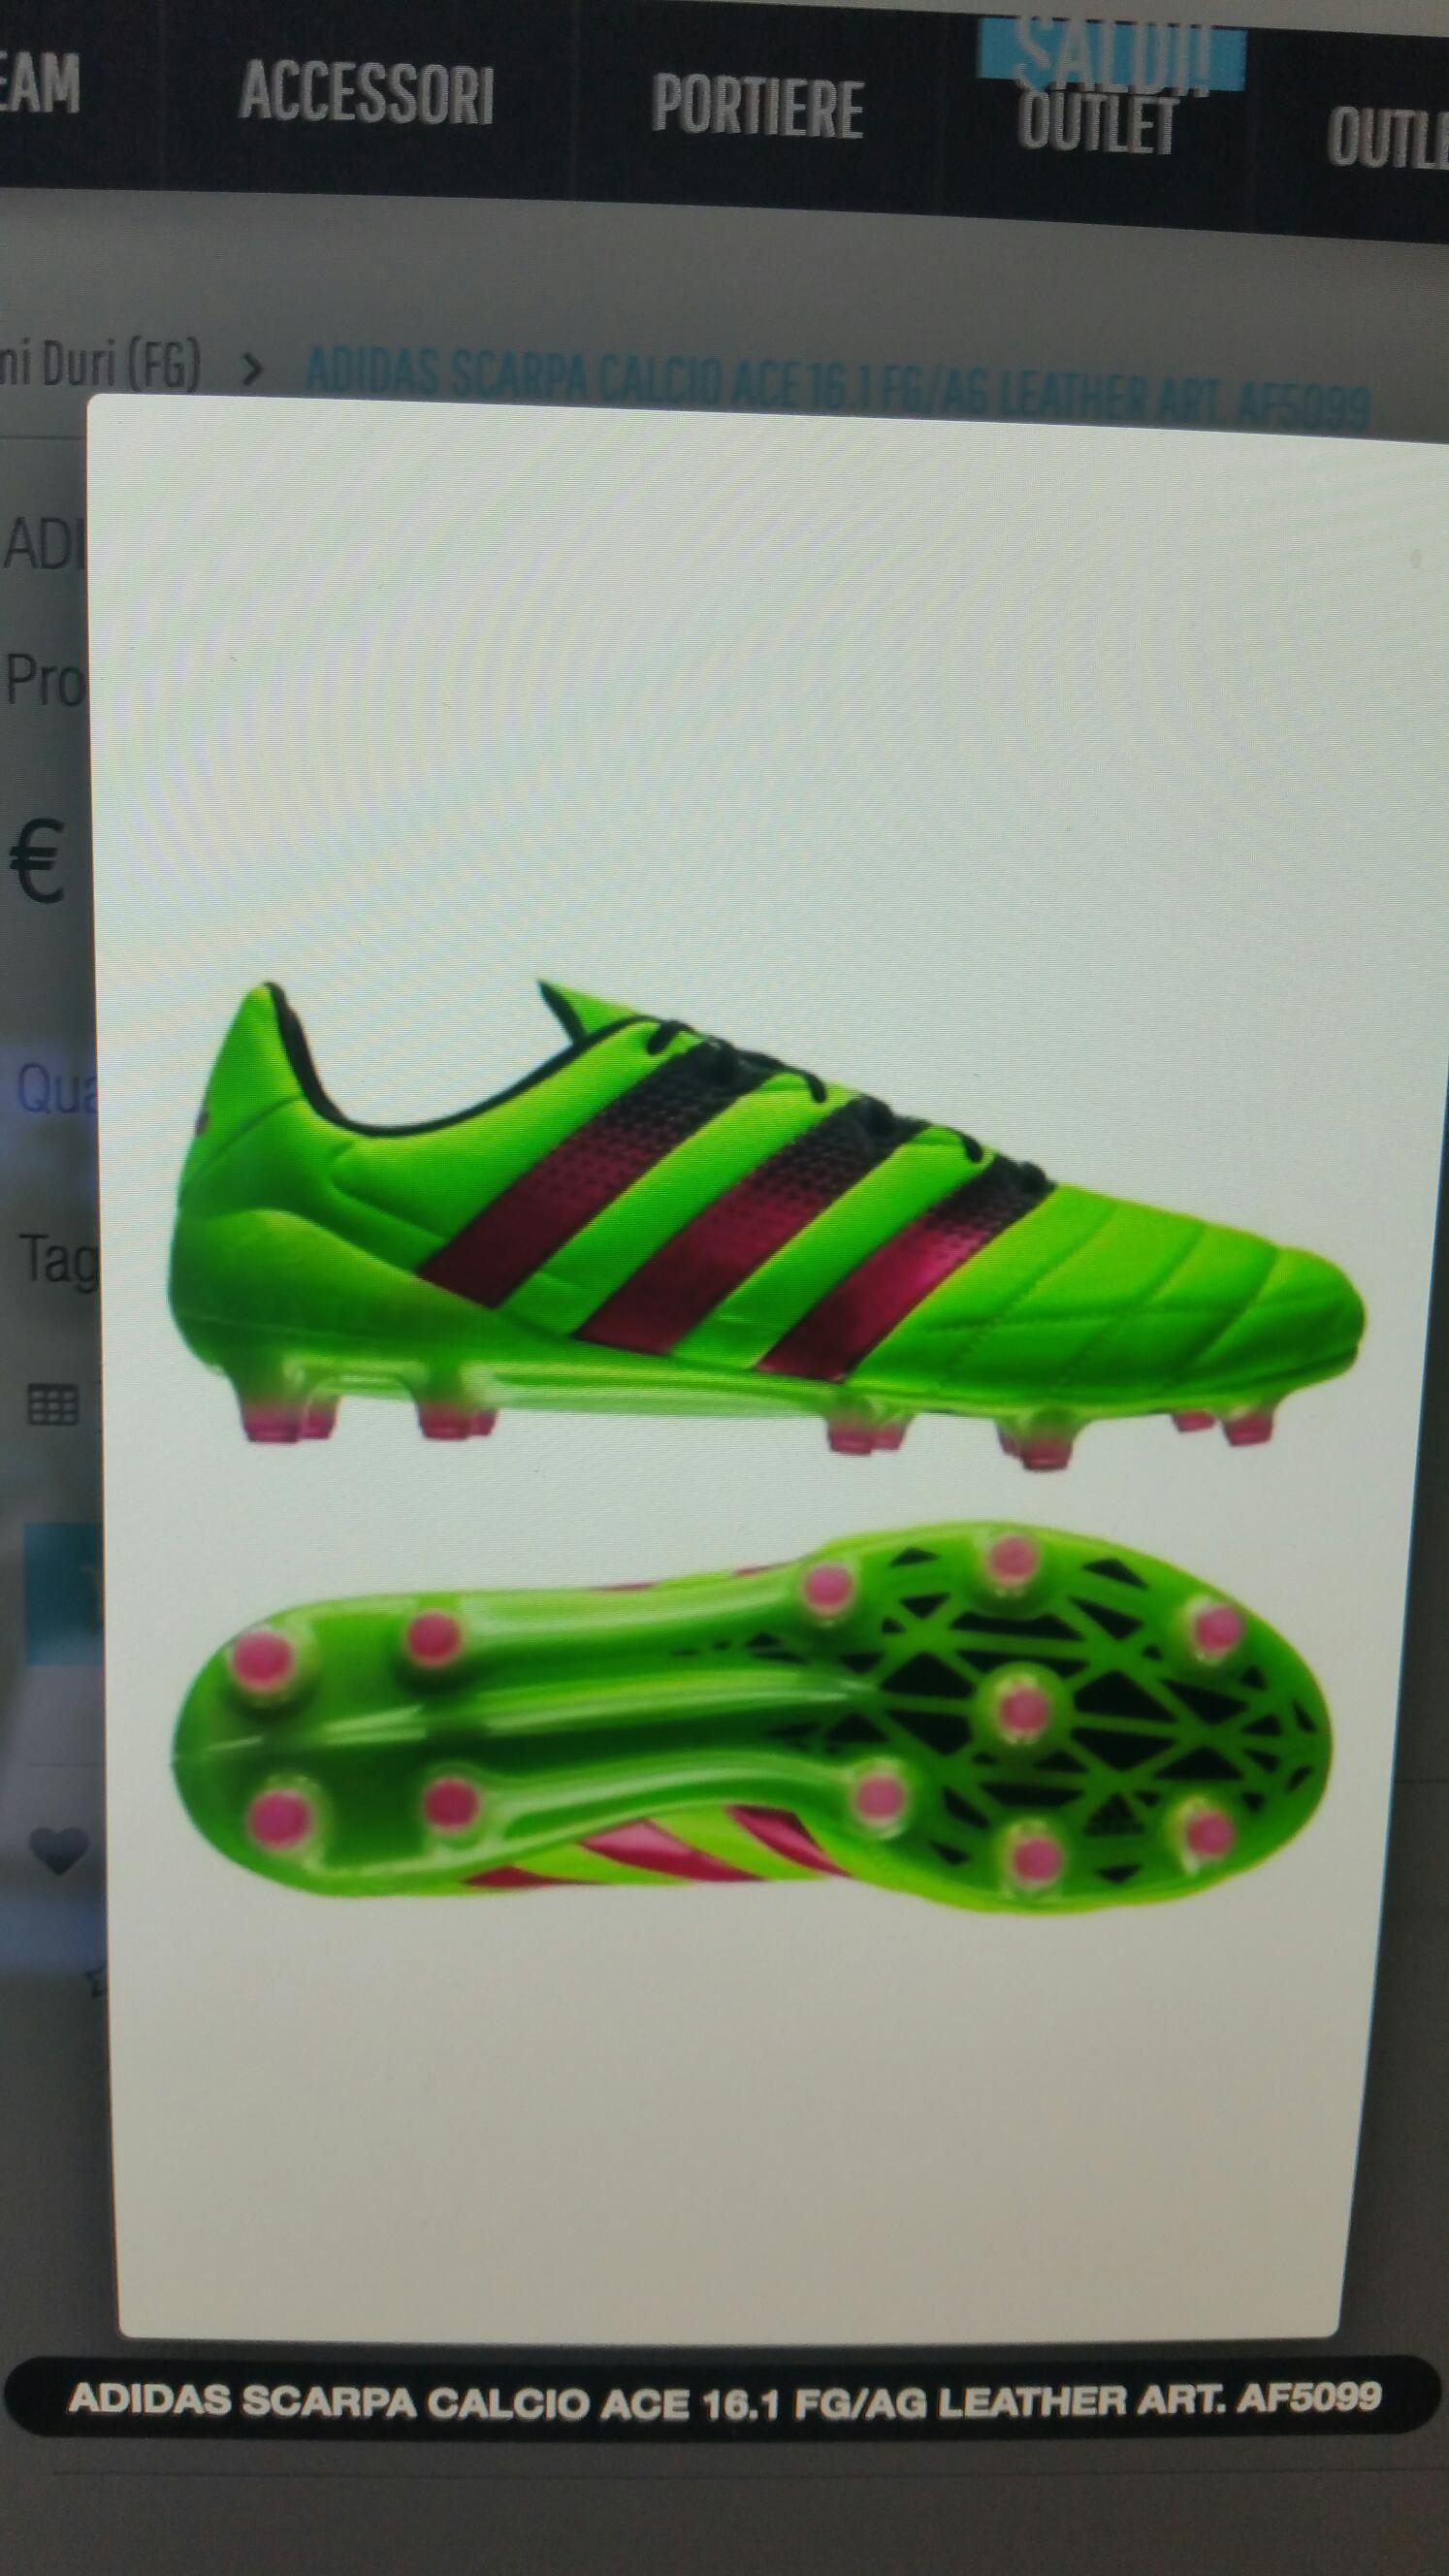 finest selection 7793e ca7cf Adidas Scarpa Calcio Ace leather, så å si NYE   FINN.no